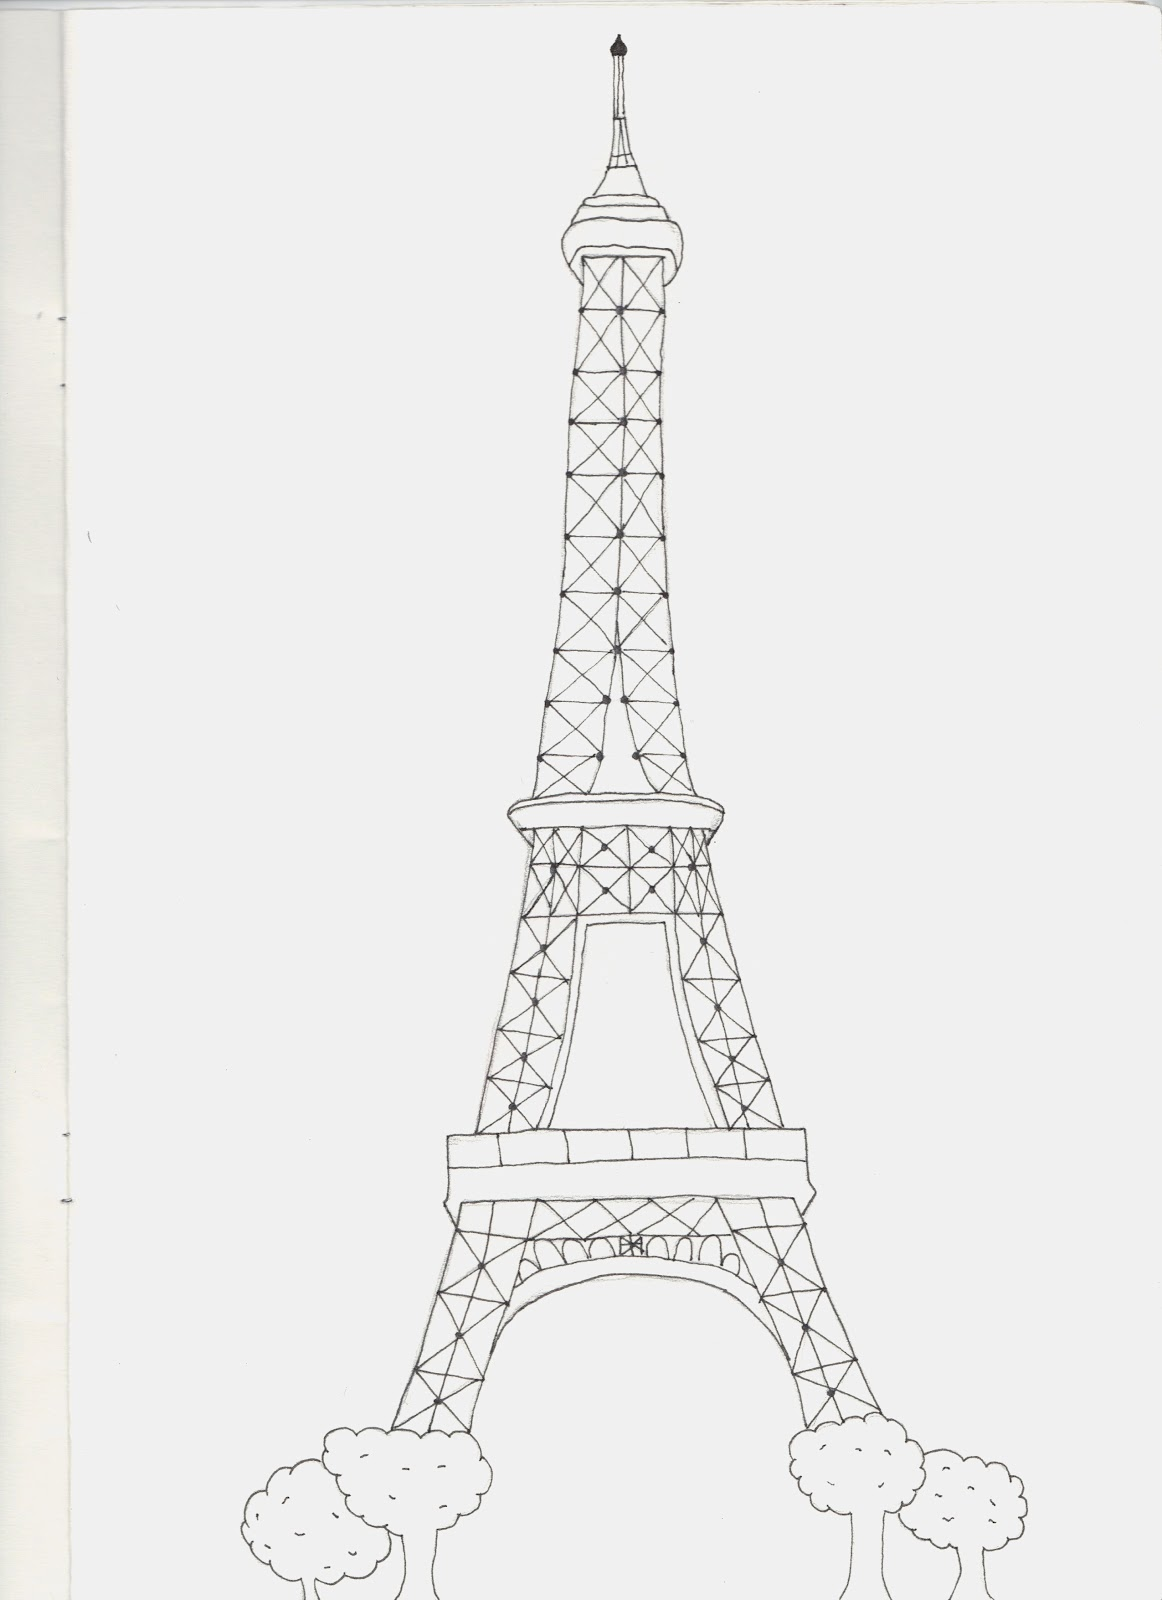 Duran Young Graphics: ( Starter Activity ) Landmark Drawings